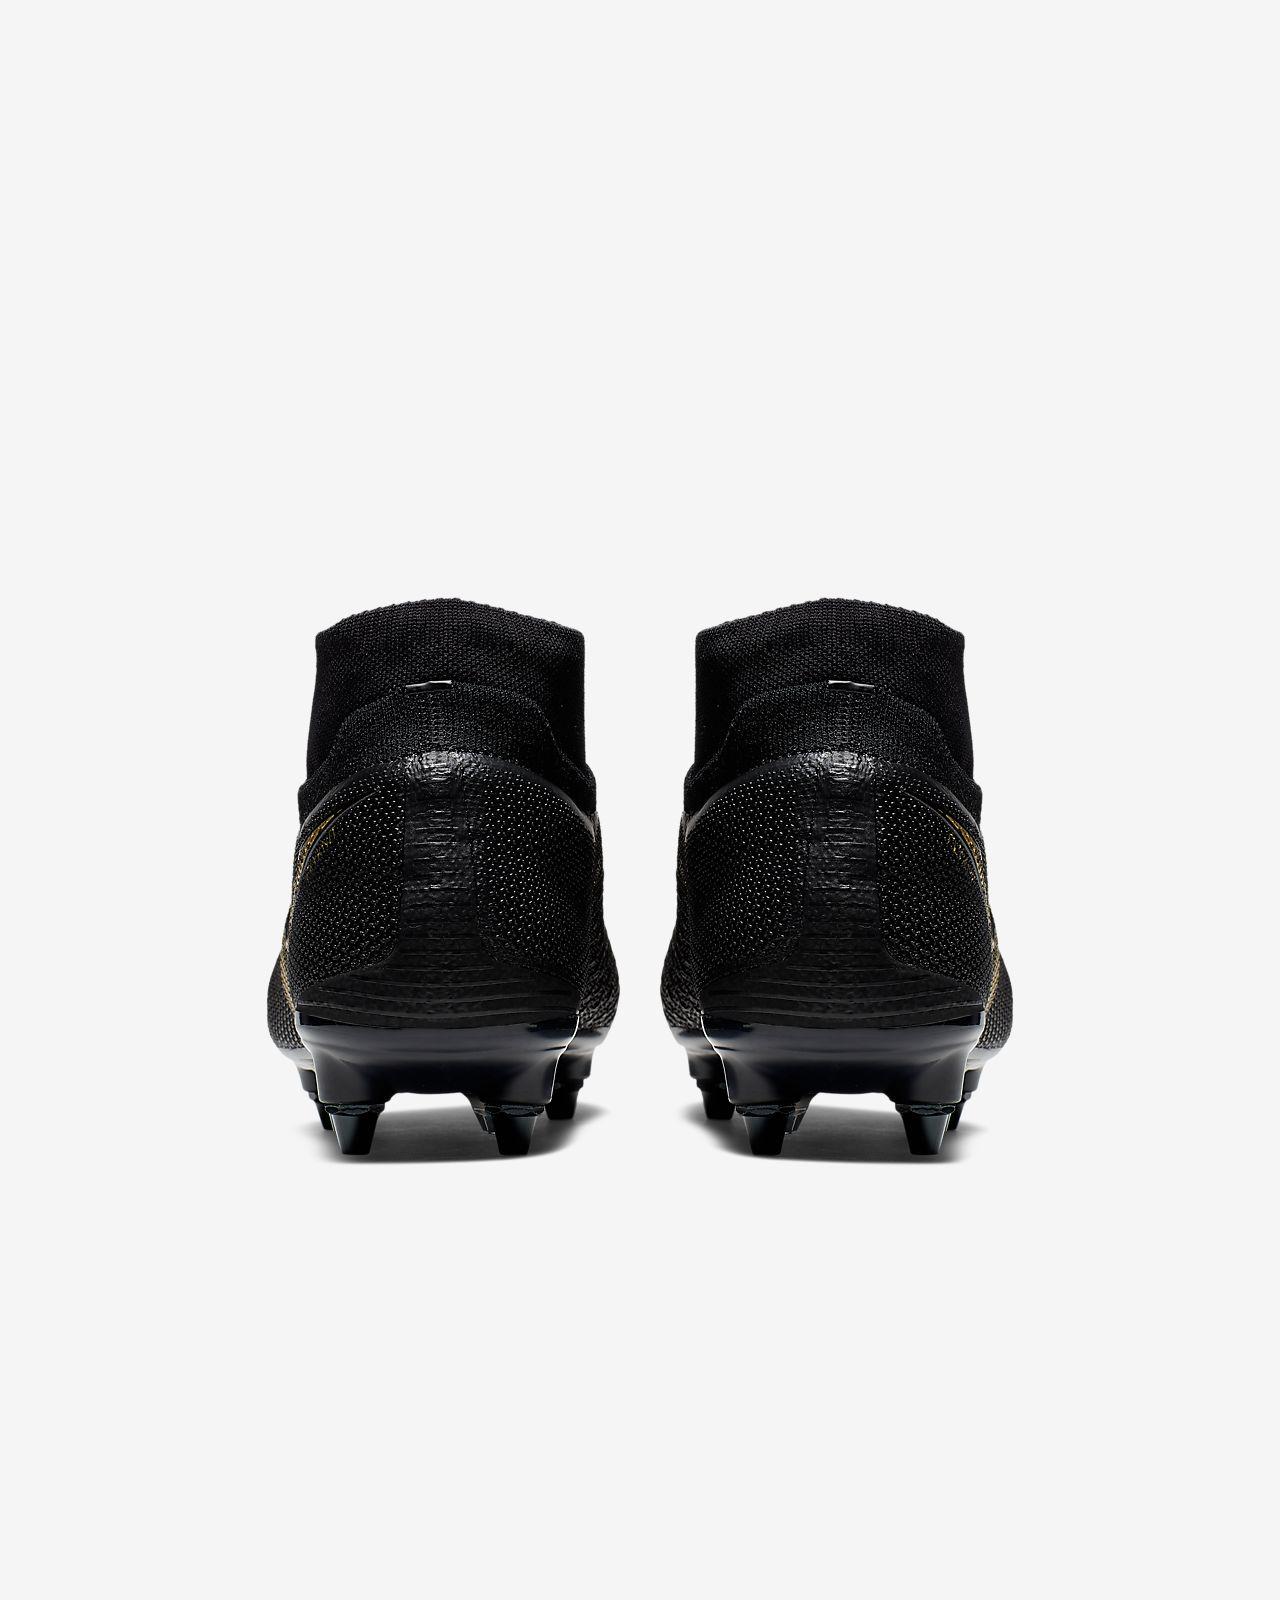 ee42a842d7c65 Nike Phantom Vision Elite Dynamic Fit Anti-Clog SG-PRO Football Boot ...